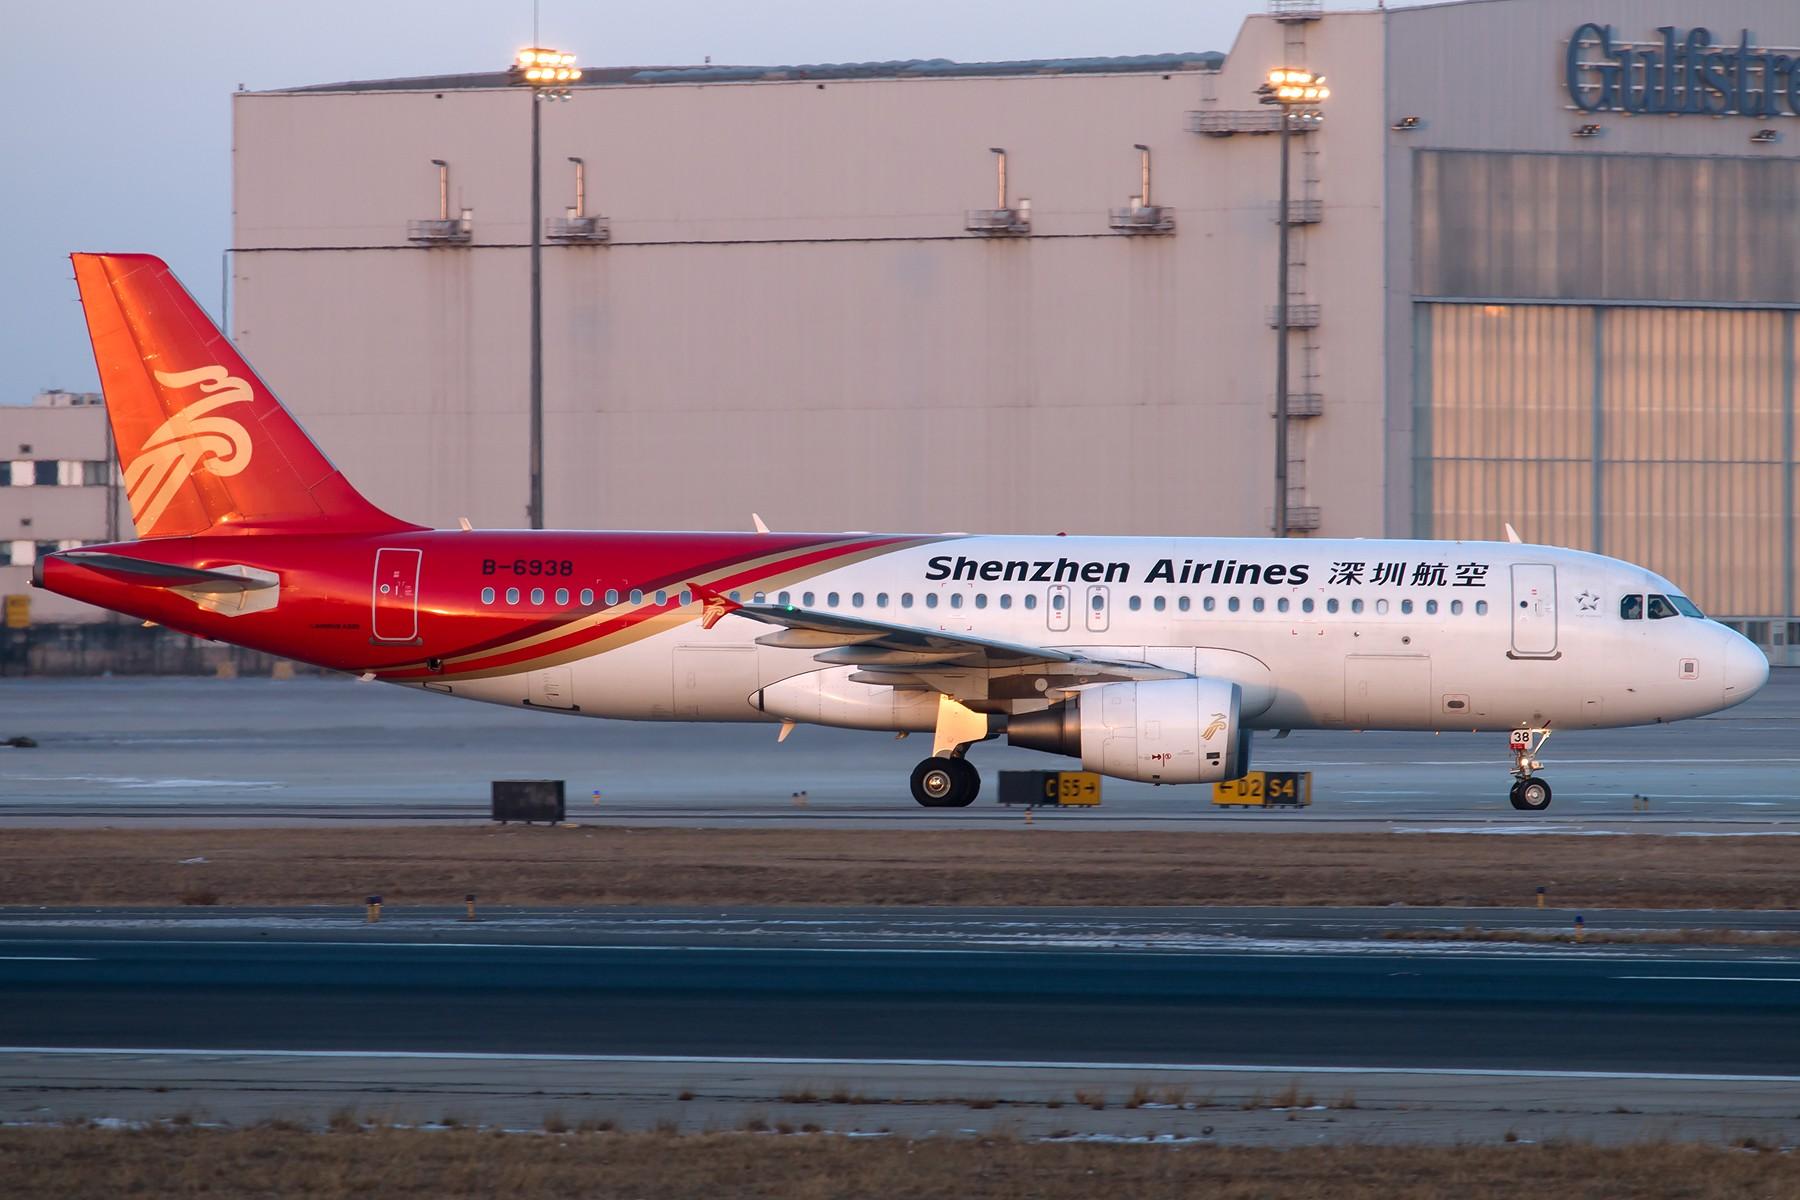 Re:[原创]2016-01-18 杂图10张 1800*1200 AIRBUS A320-214 B-6938 中国北京首都国际机场